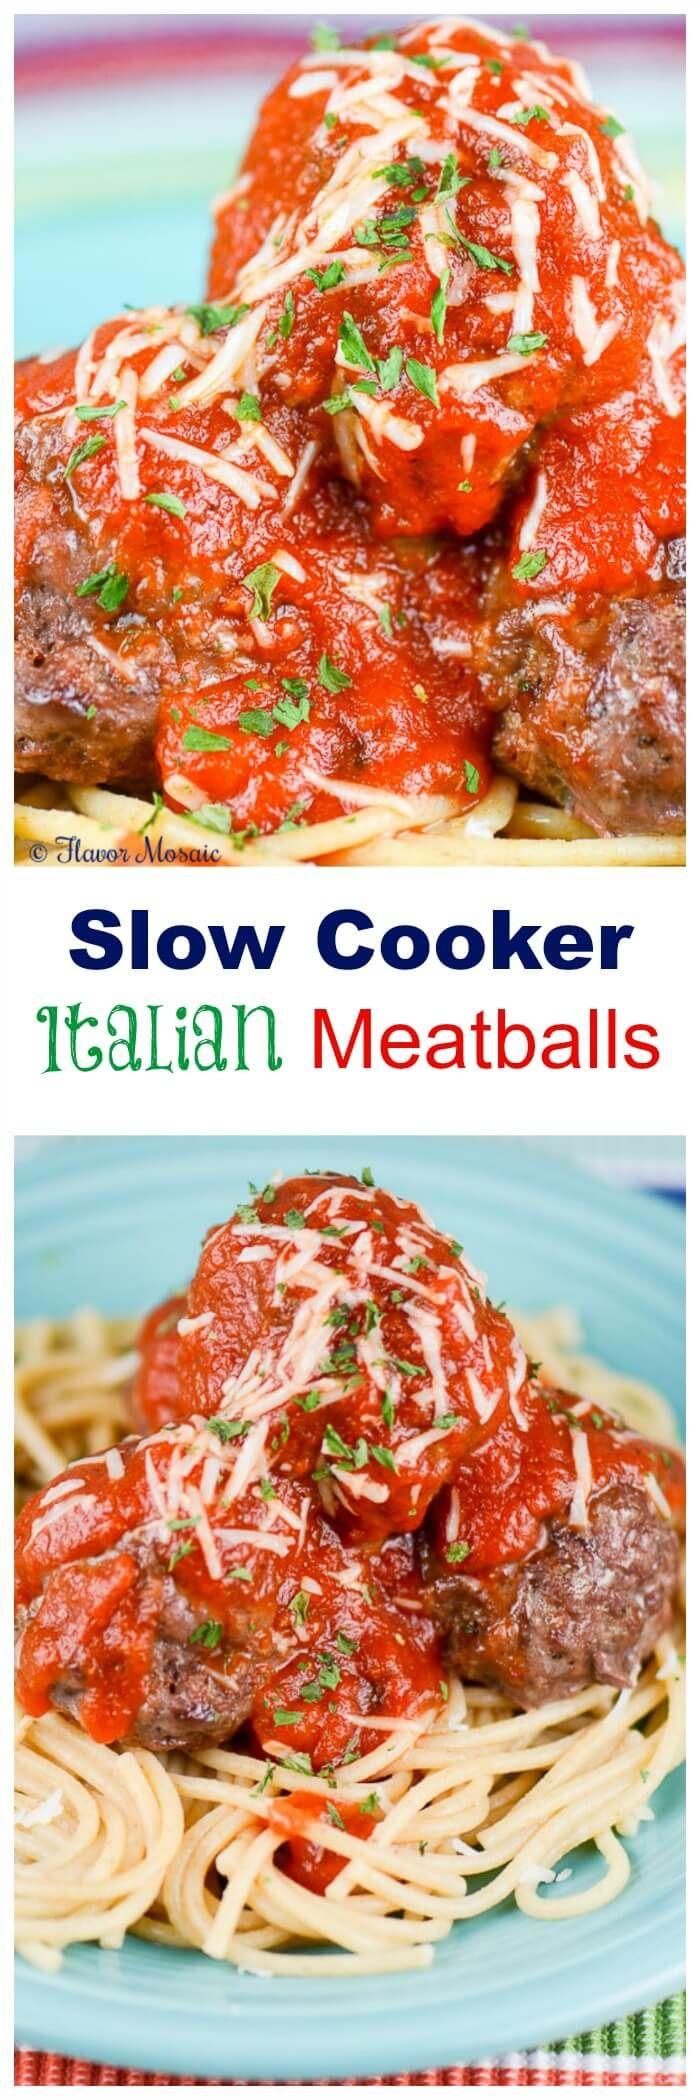 Crock pot recipes, slow cooker recipes, Italian food, cuisine, yummy, marinara